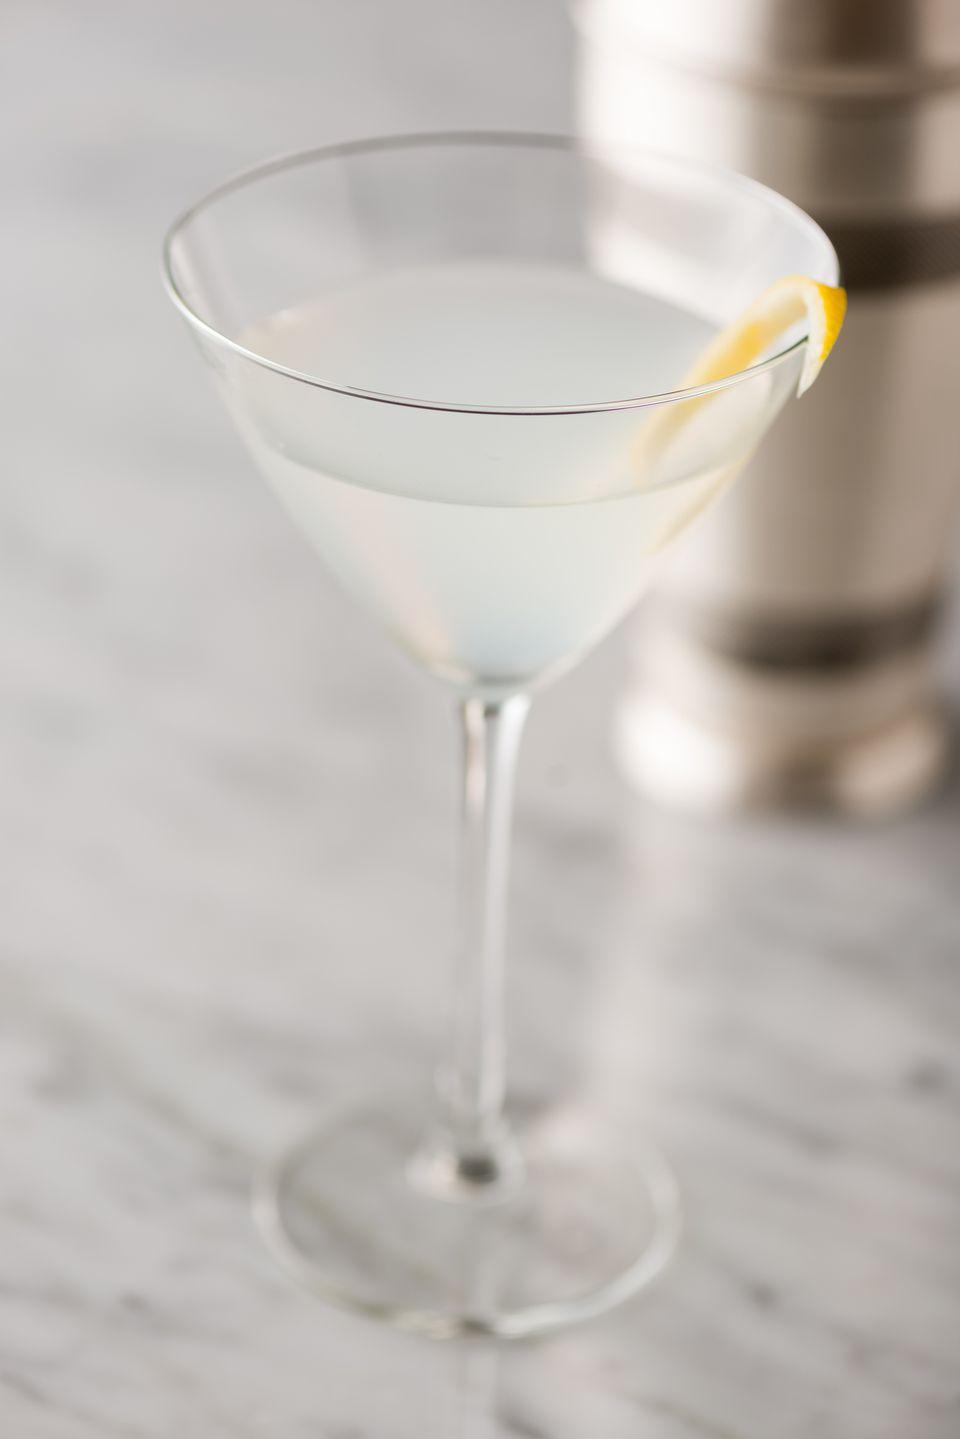 vodkamartini.jpg